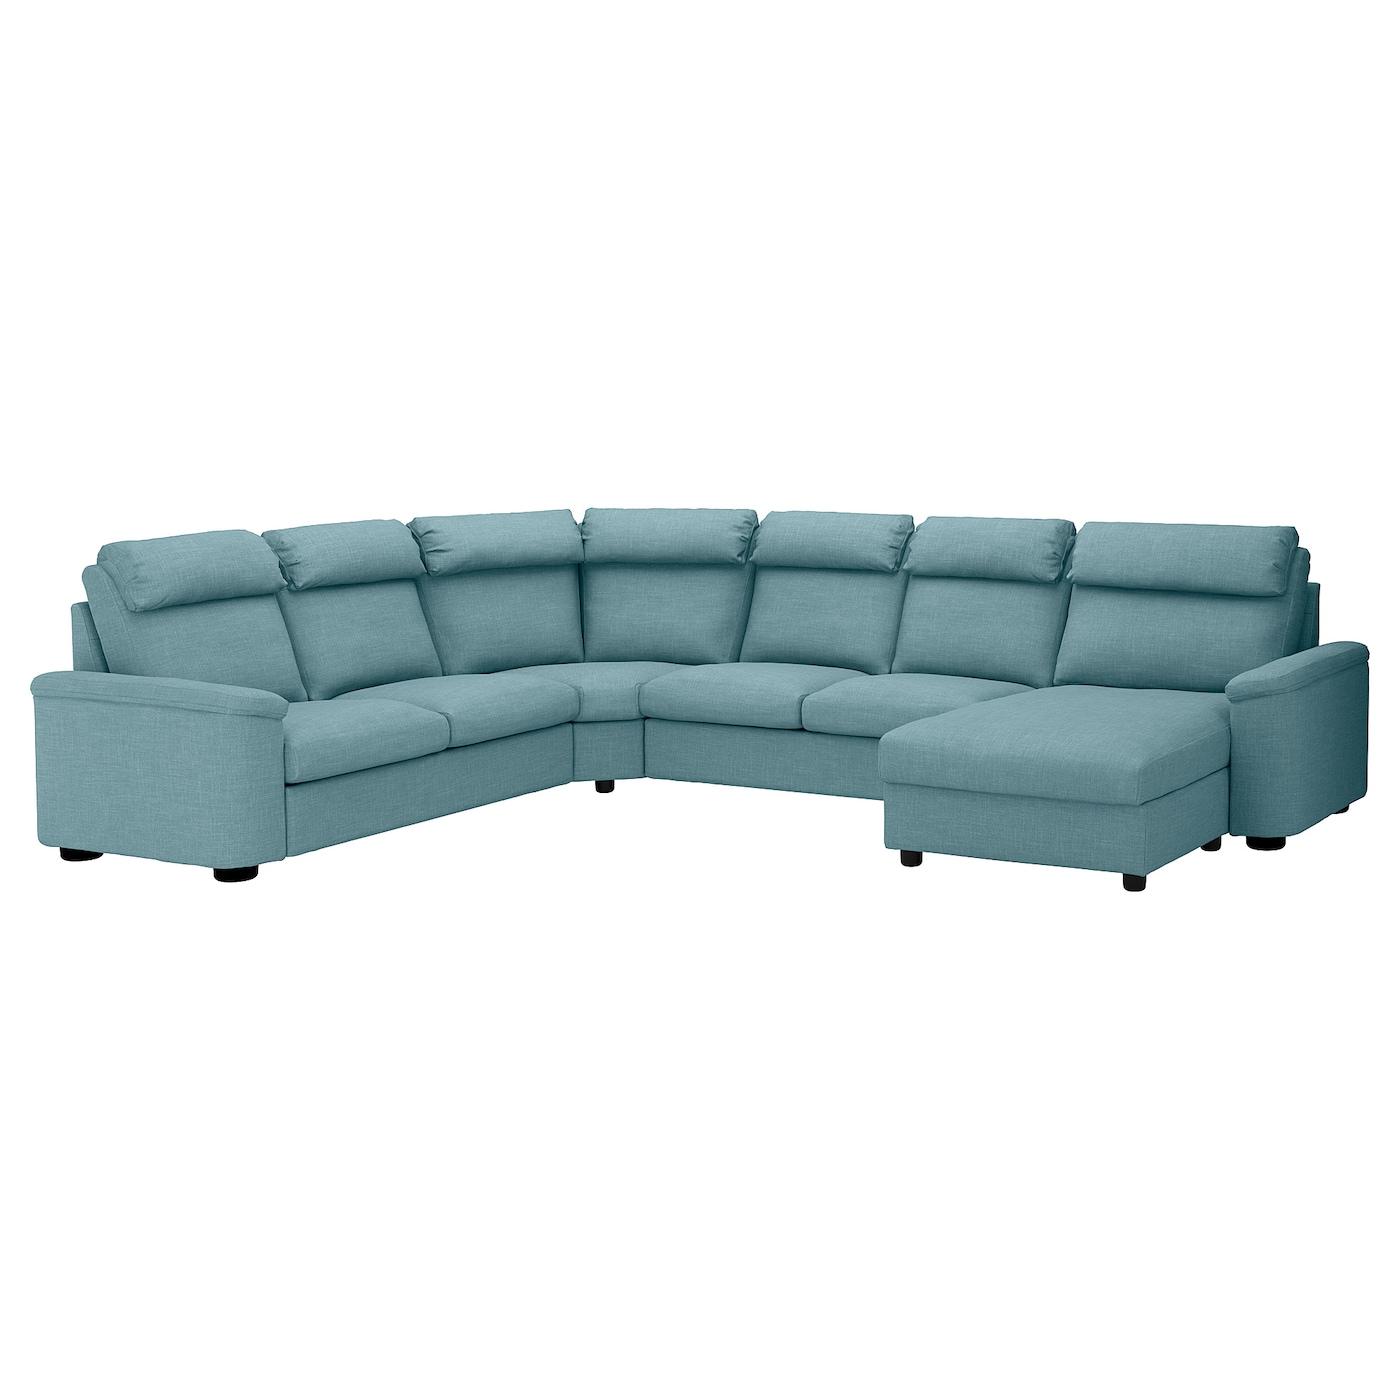 Sofas Rinconera Compra Online Ikea